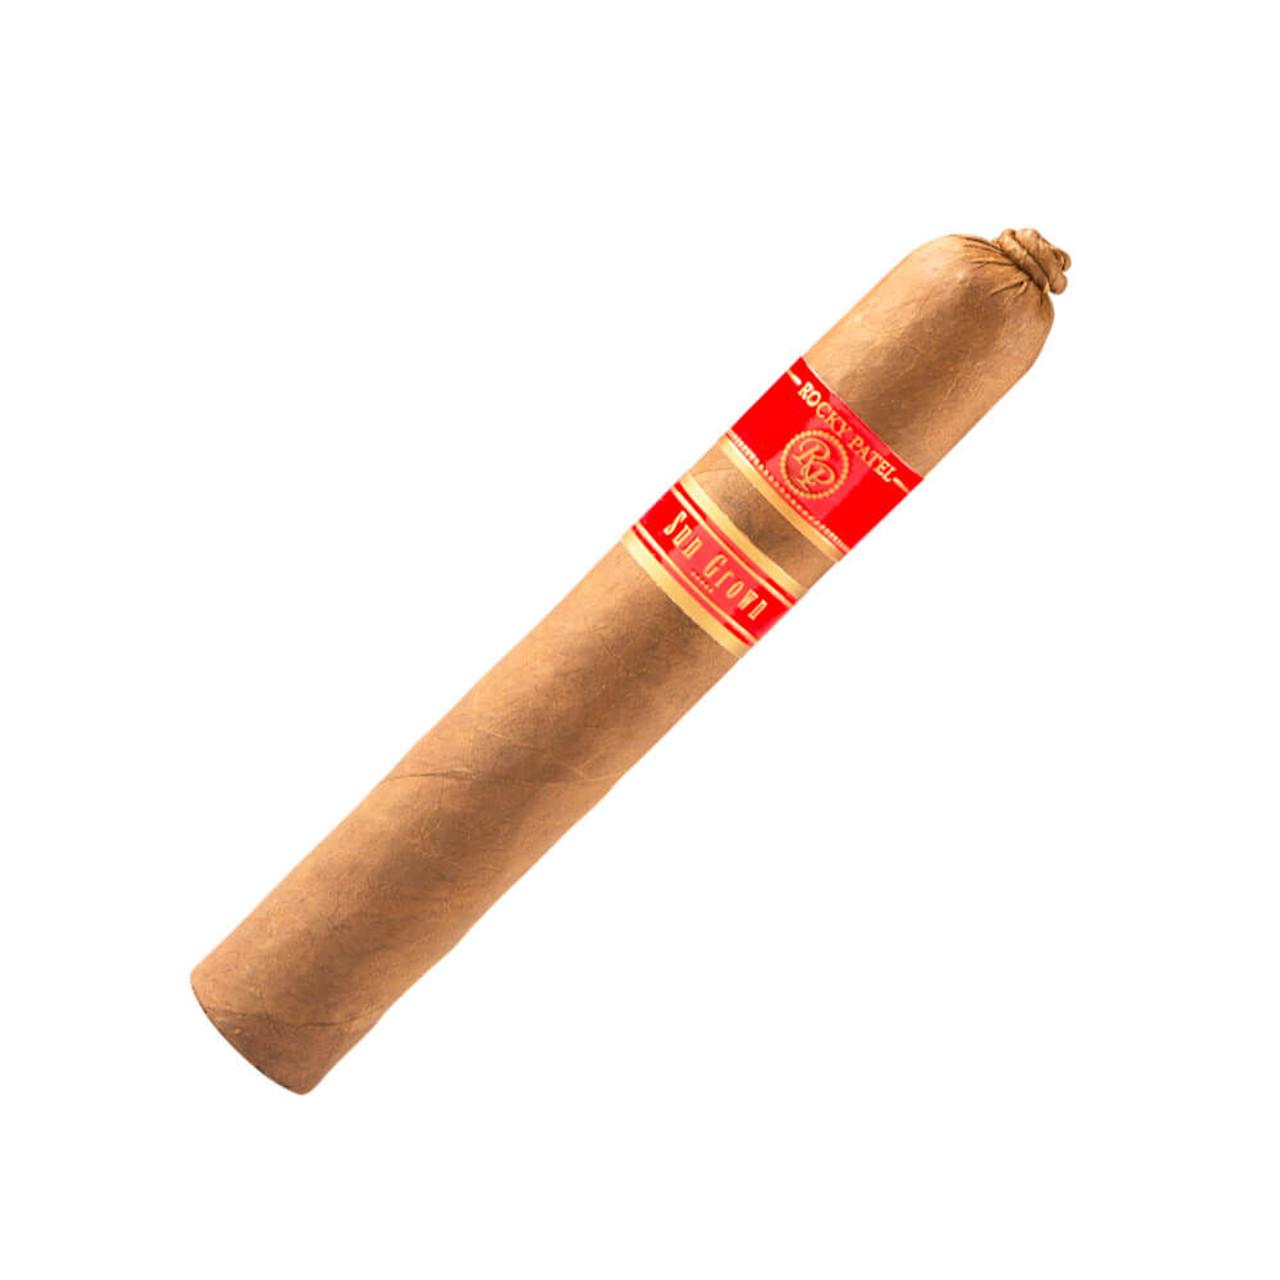 Rocky Patel Sun Grown Sixty Cigars - 6 x 60 (Box of 20)